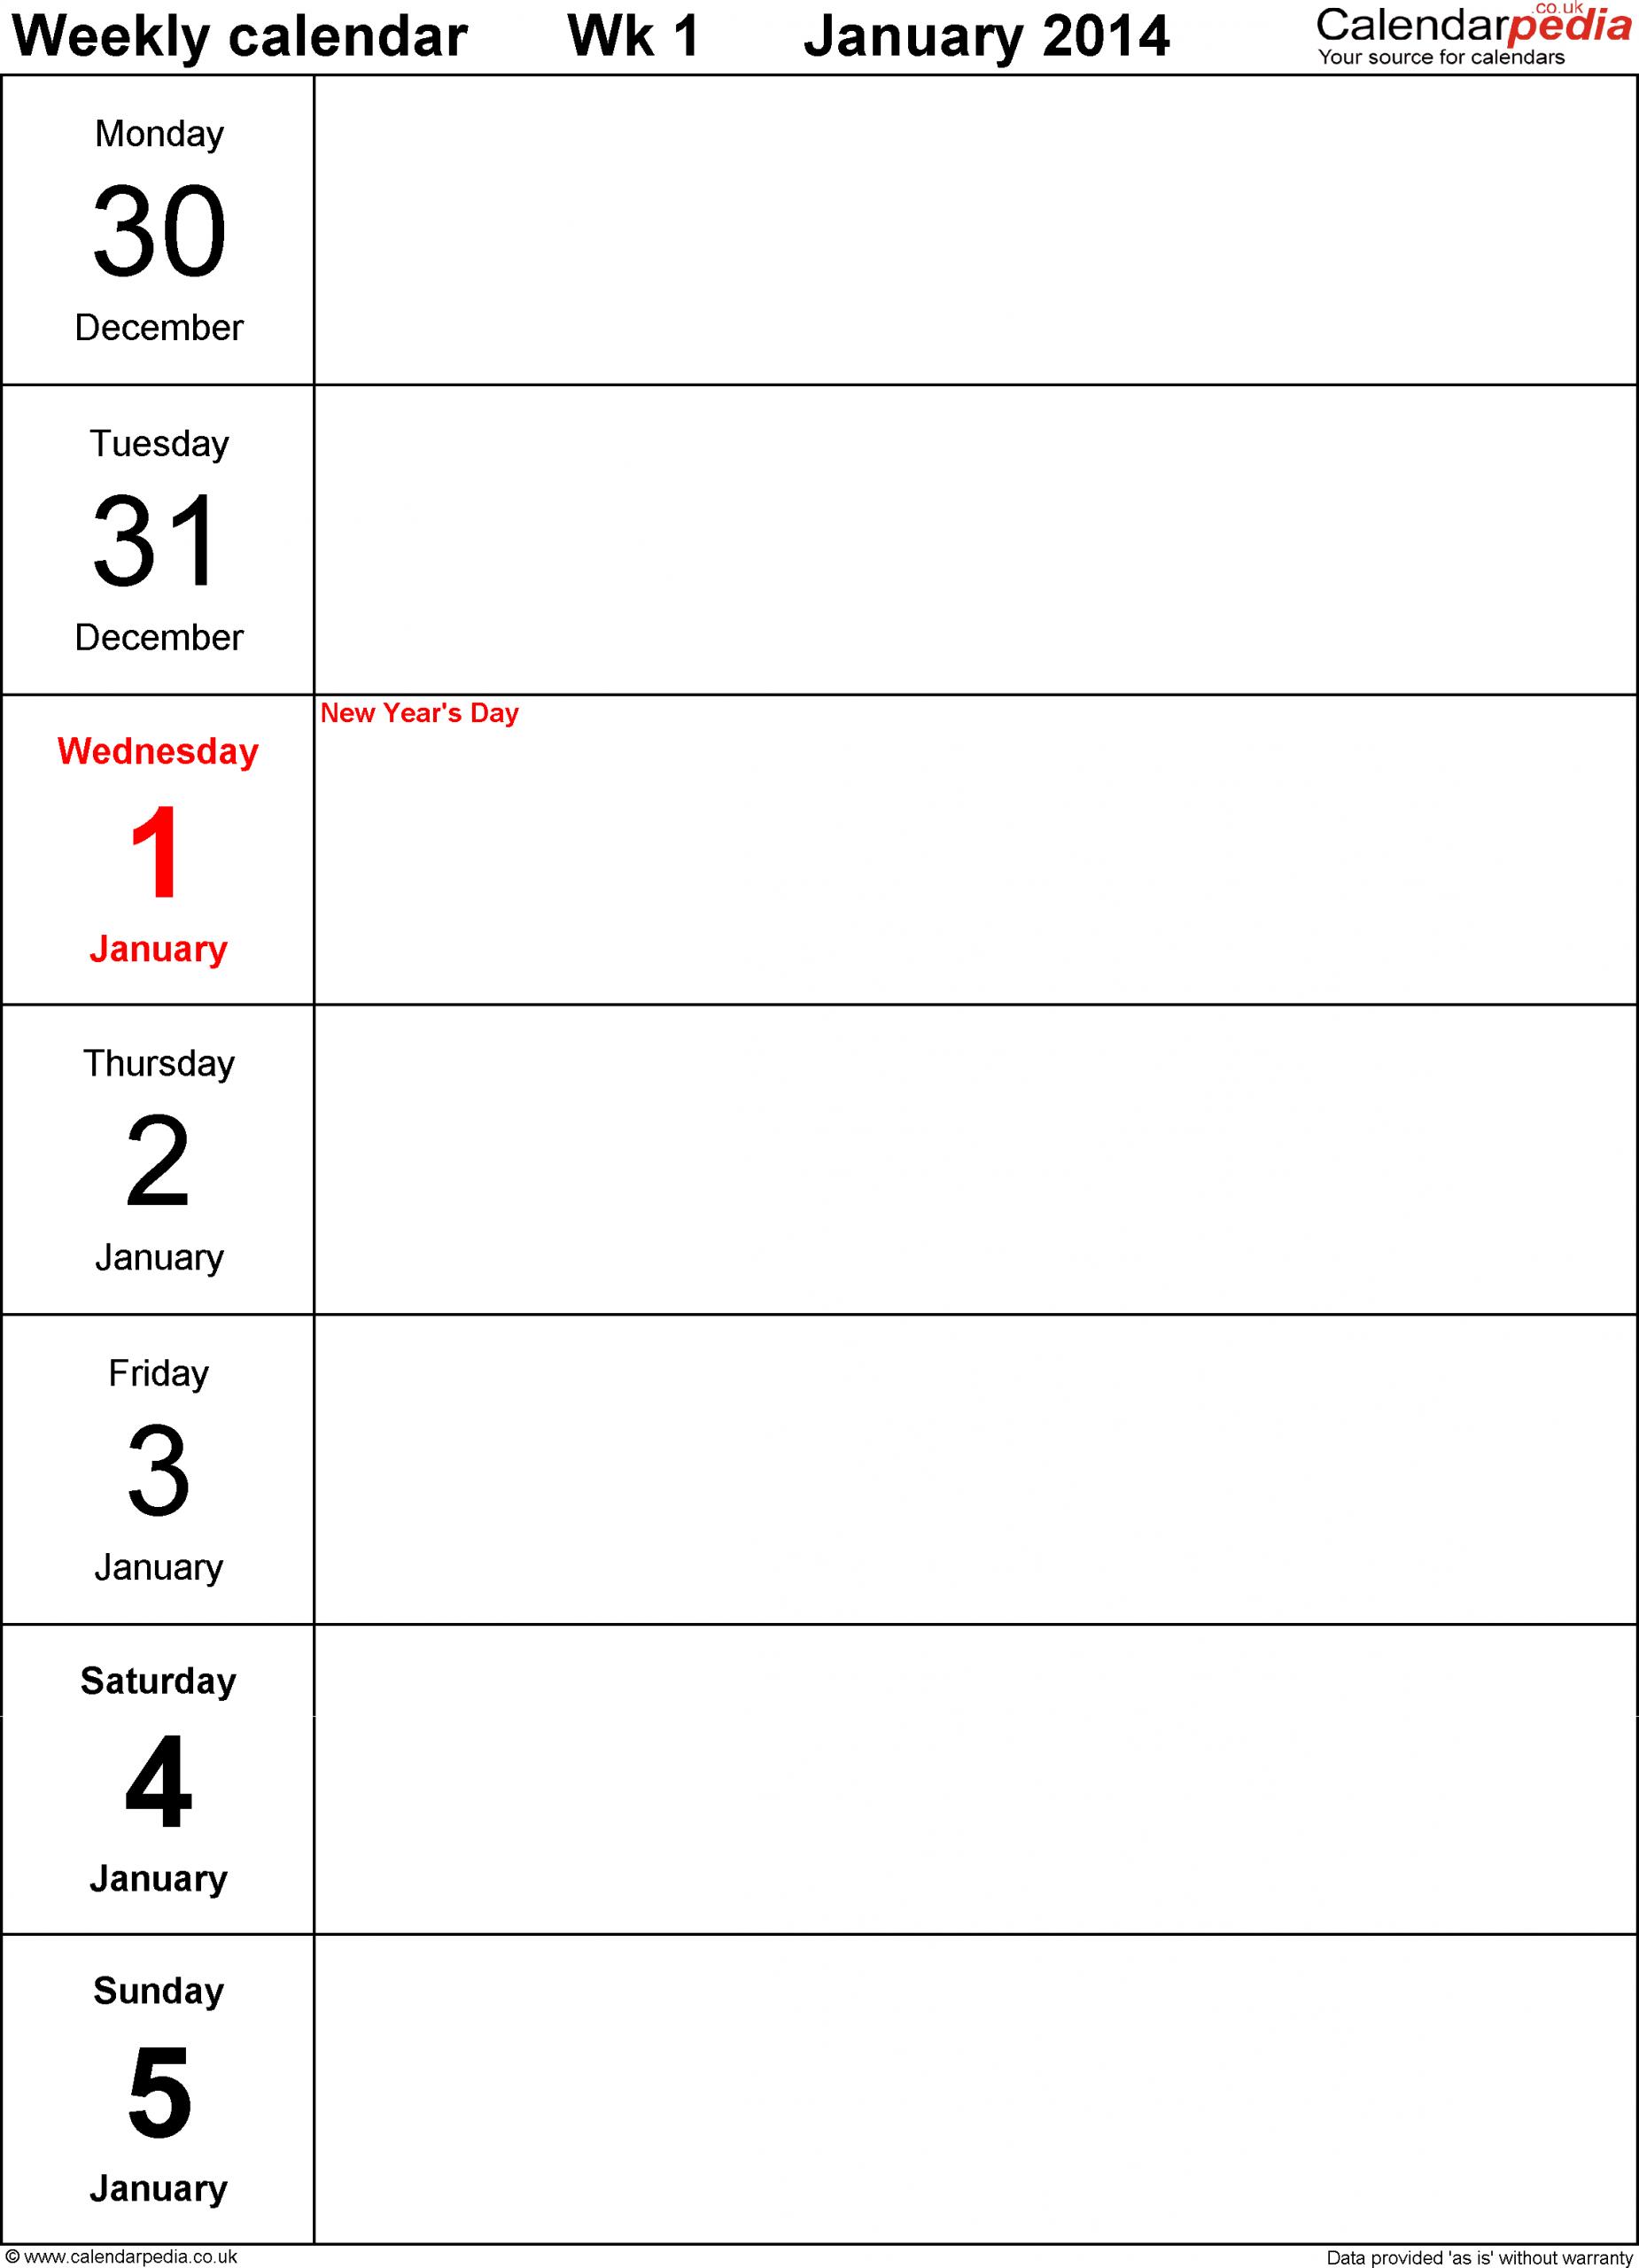 Weekly Calendar 2014 Uk - Free Printable Templates For Pdf